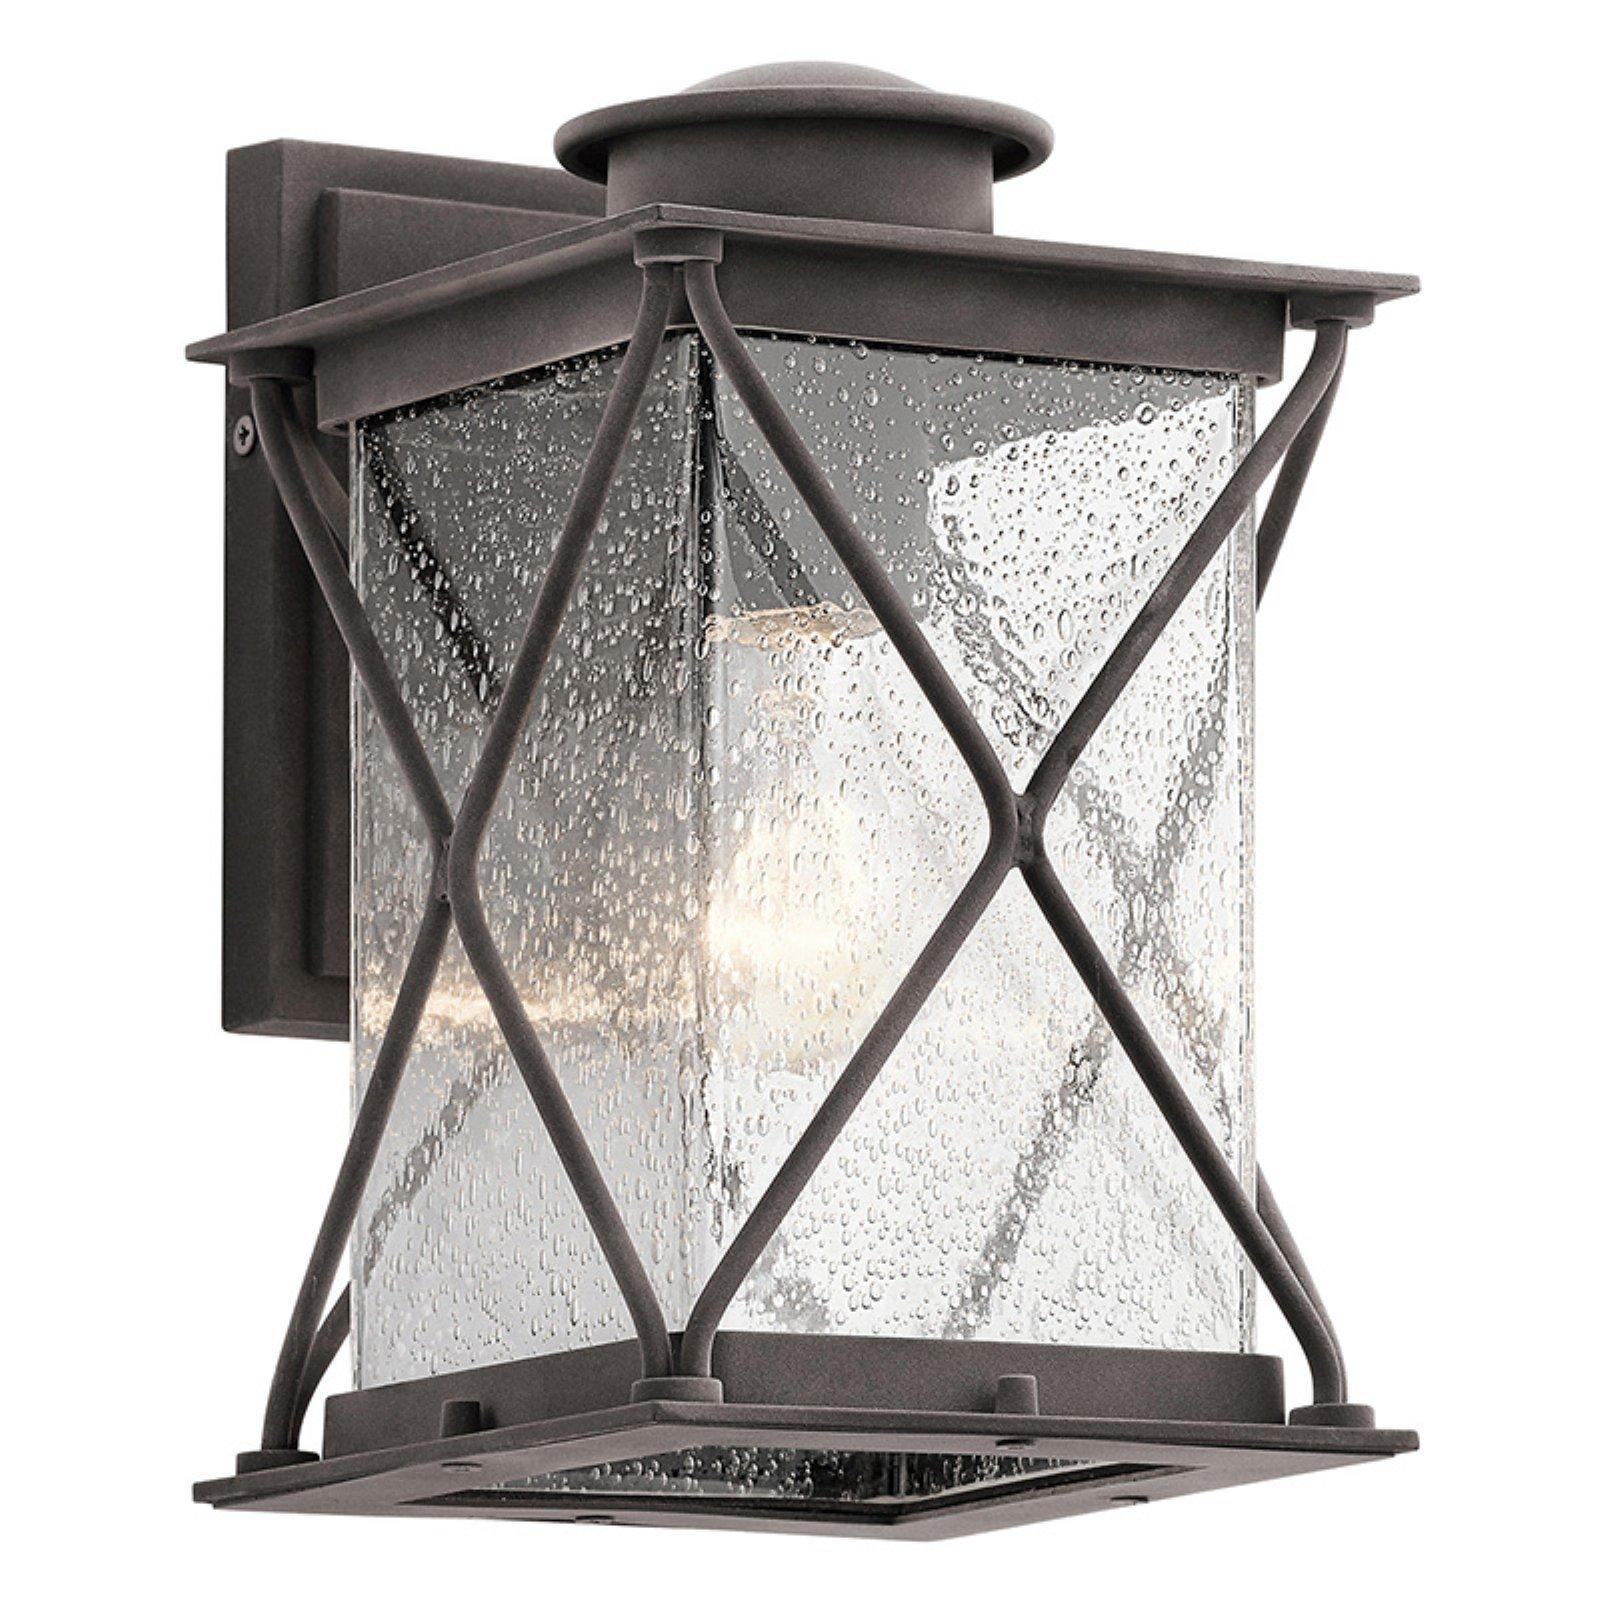 Kichler Argyle 49743WZCL18 Outdoor Wall Light